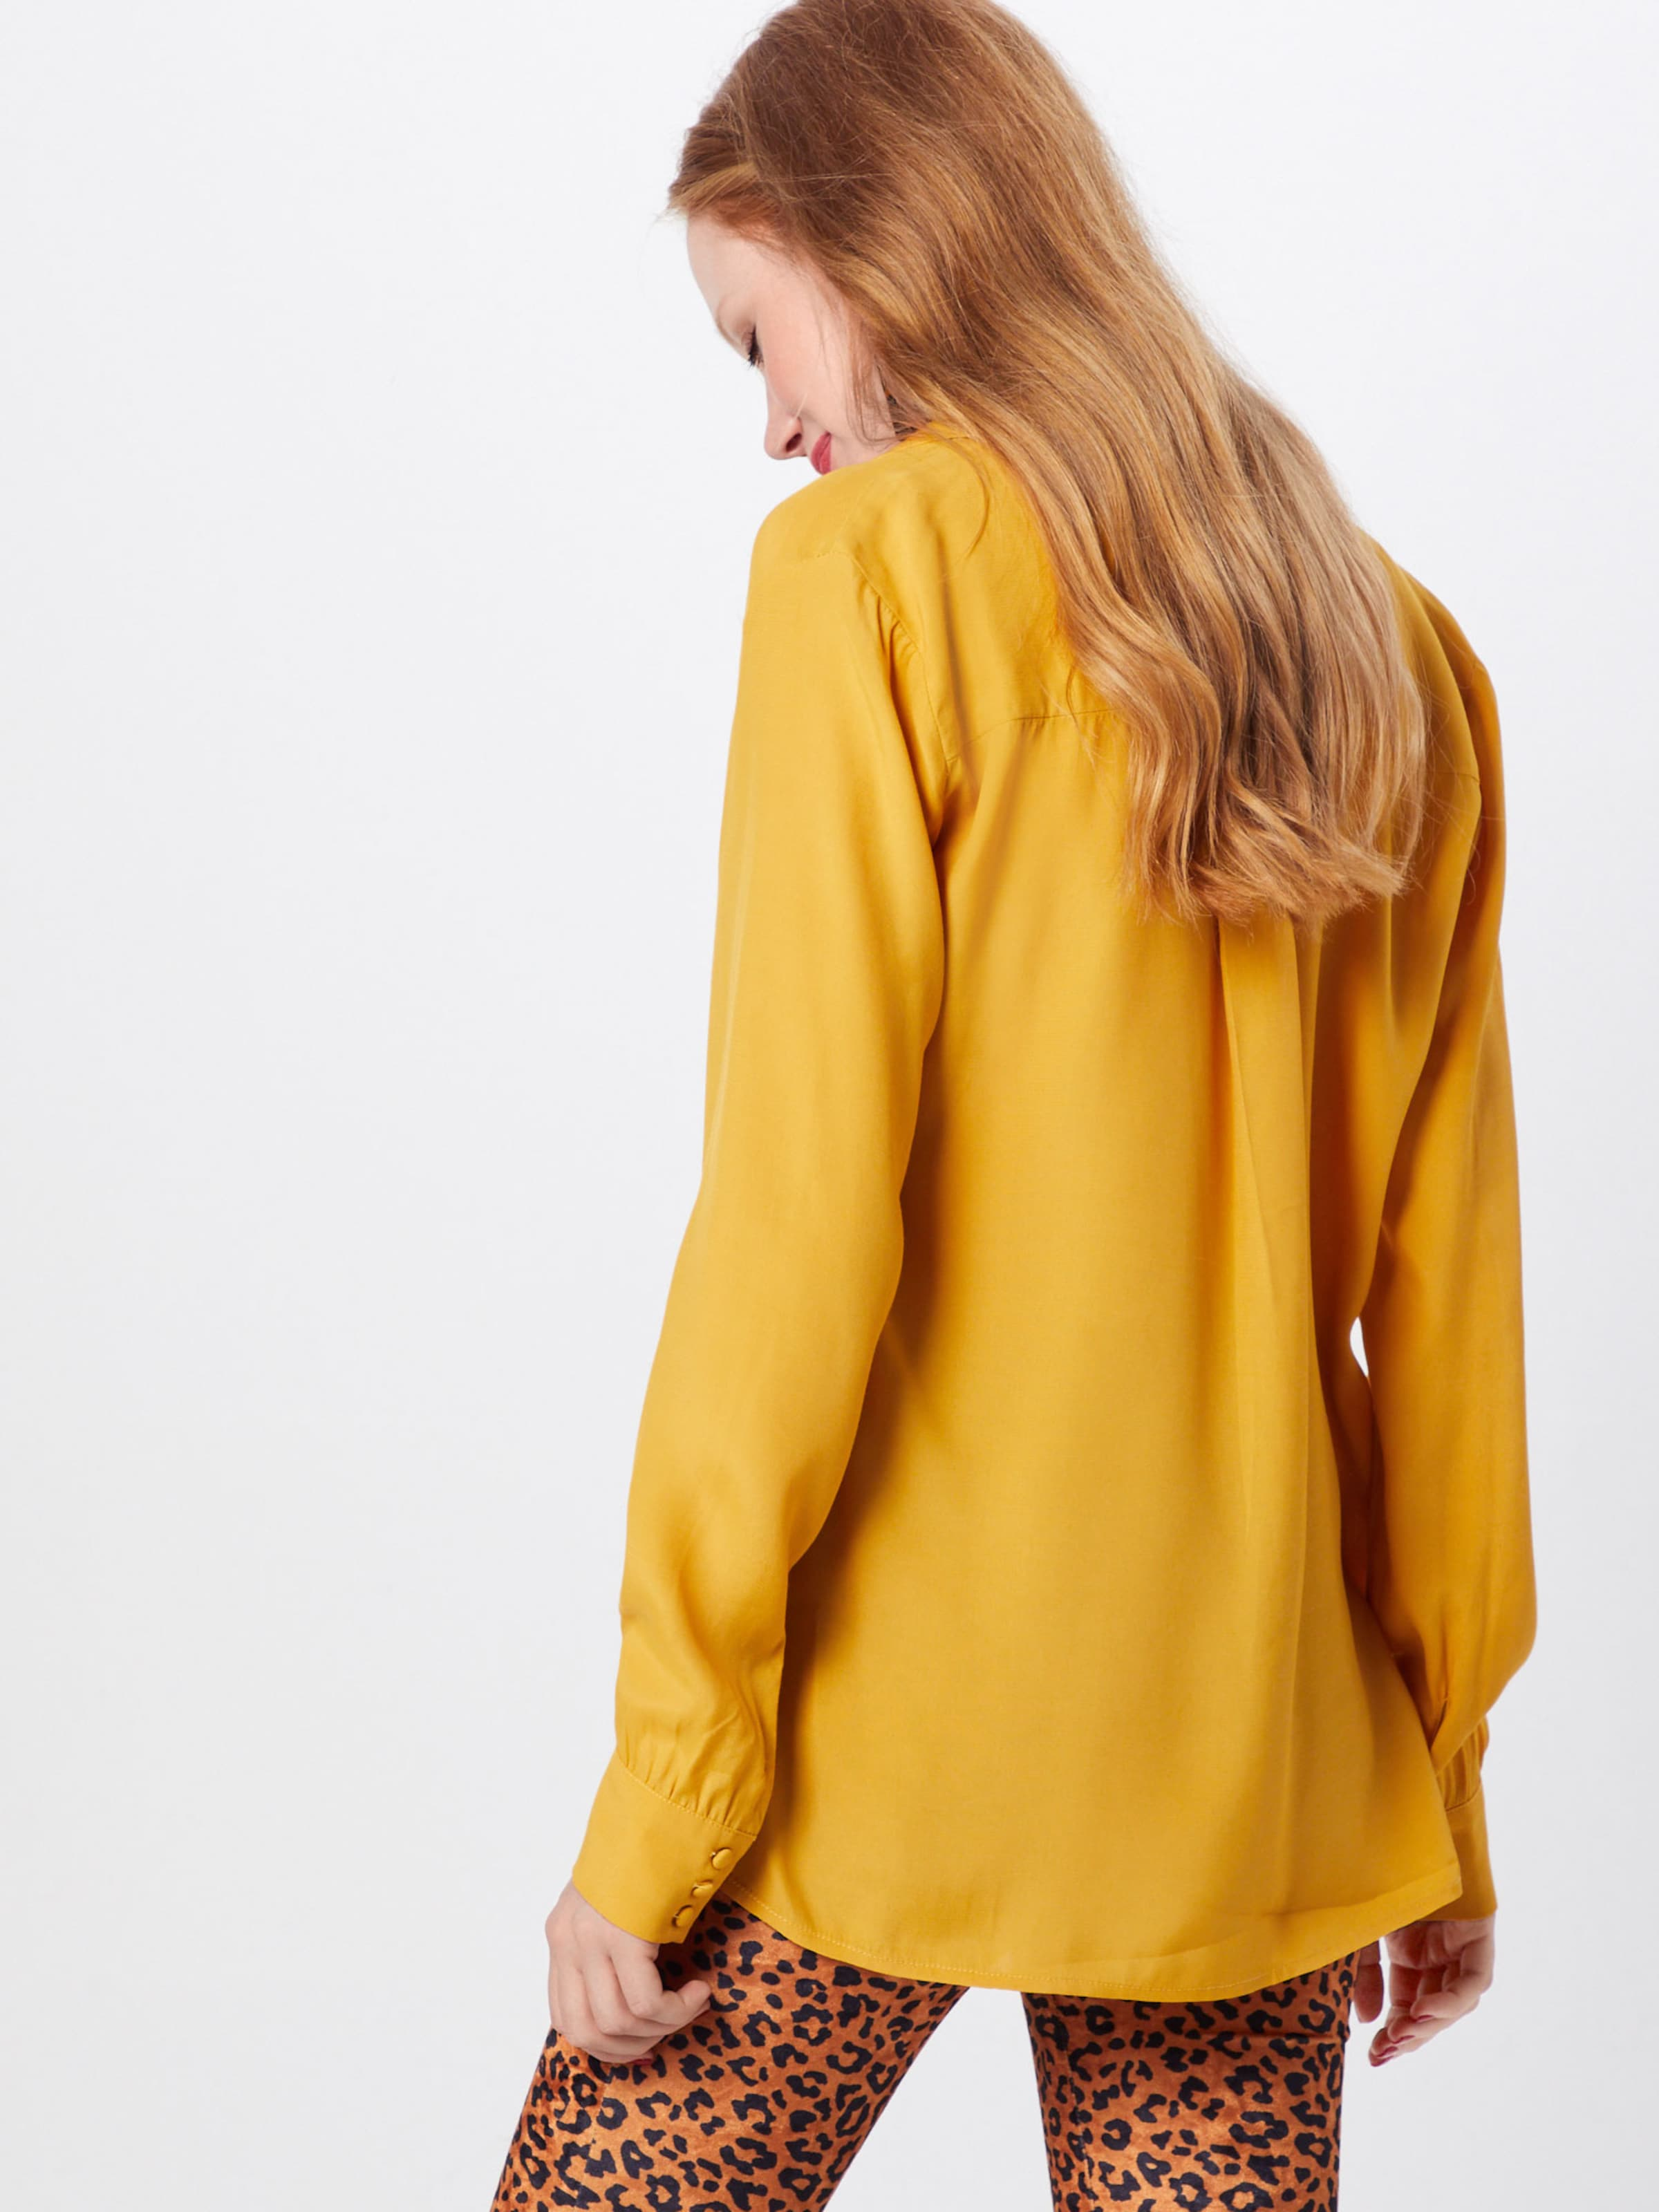 Chemisier Jaune En 'ryder Modström Shirt' rxWodBeC